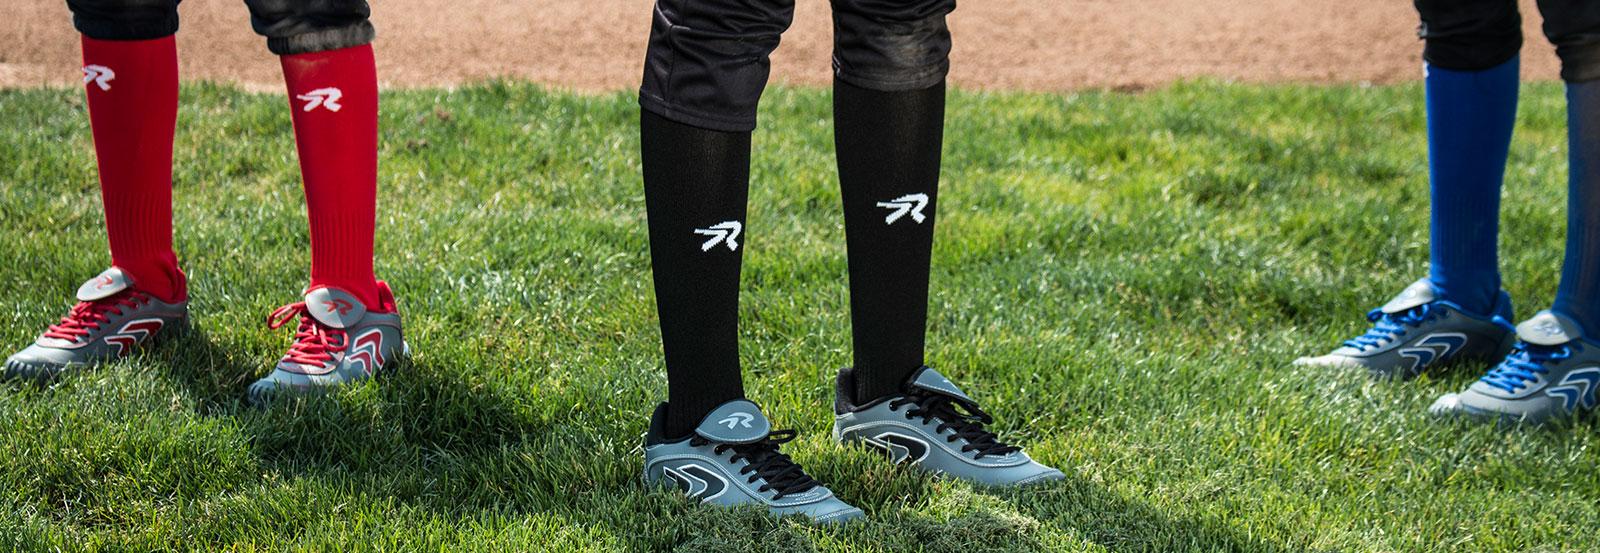 Softball cleats ringor fastpitch softball jpg 1600x553 Tanel softball shoes  cleats 0371f9d743b